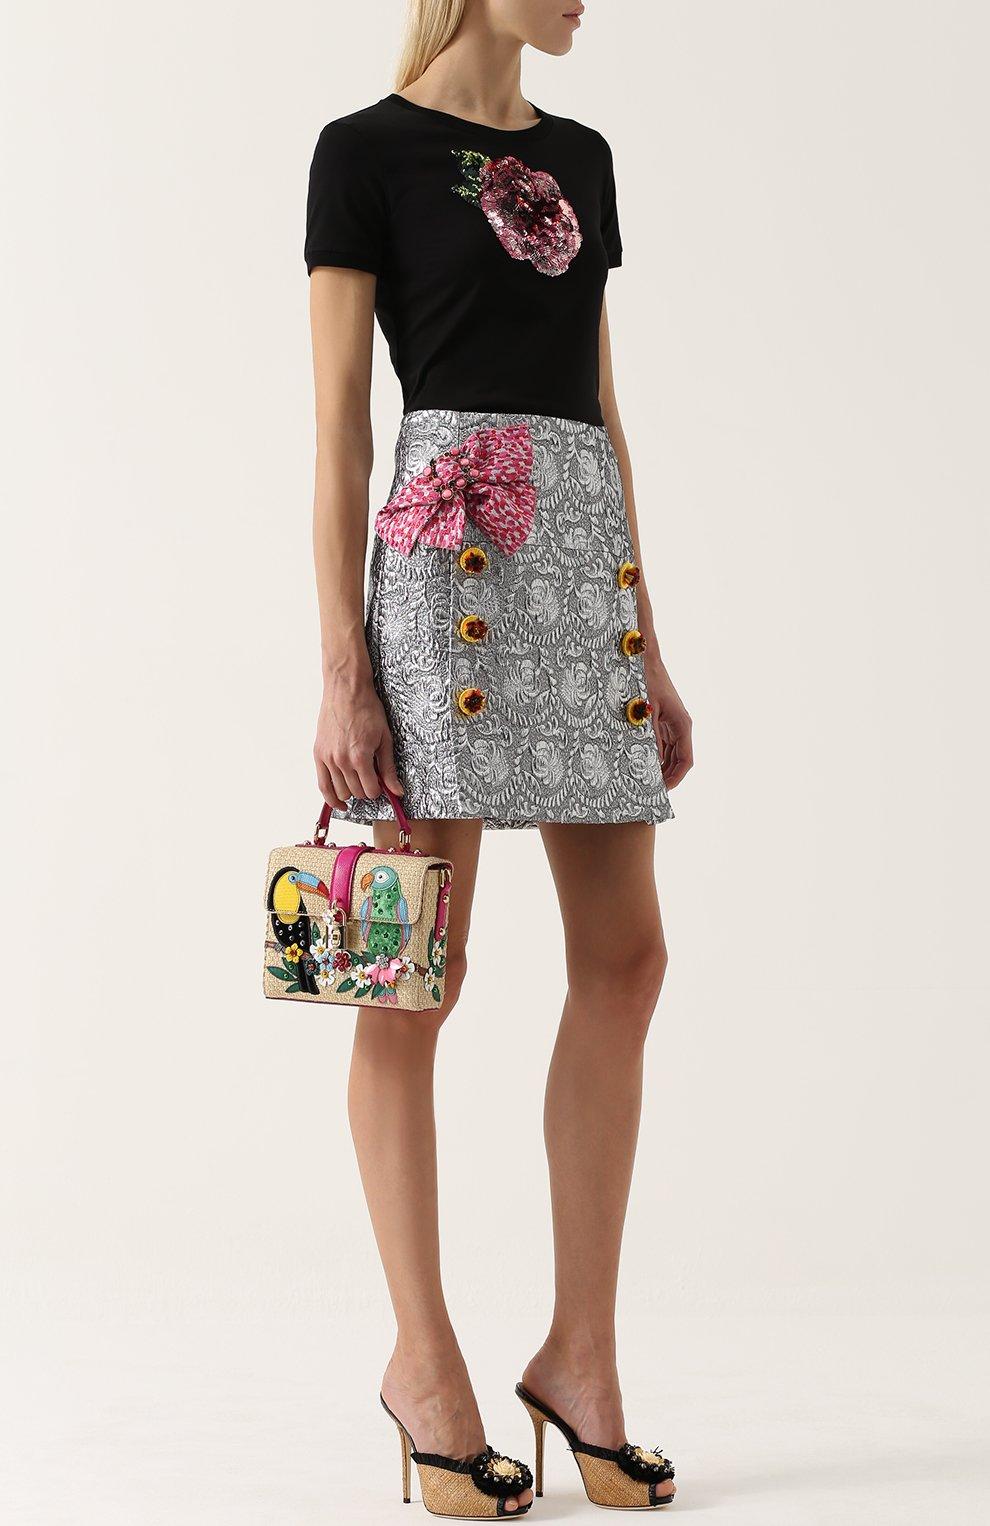 Мюли Keira из соломки с брошью Dolce & Gabbana бежевые   Фото №2